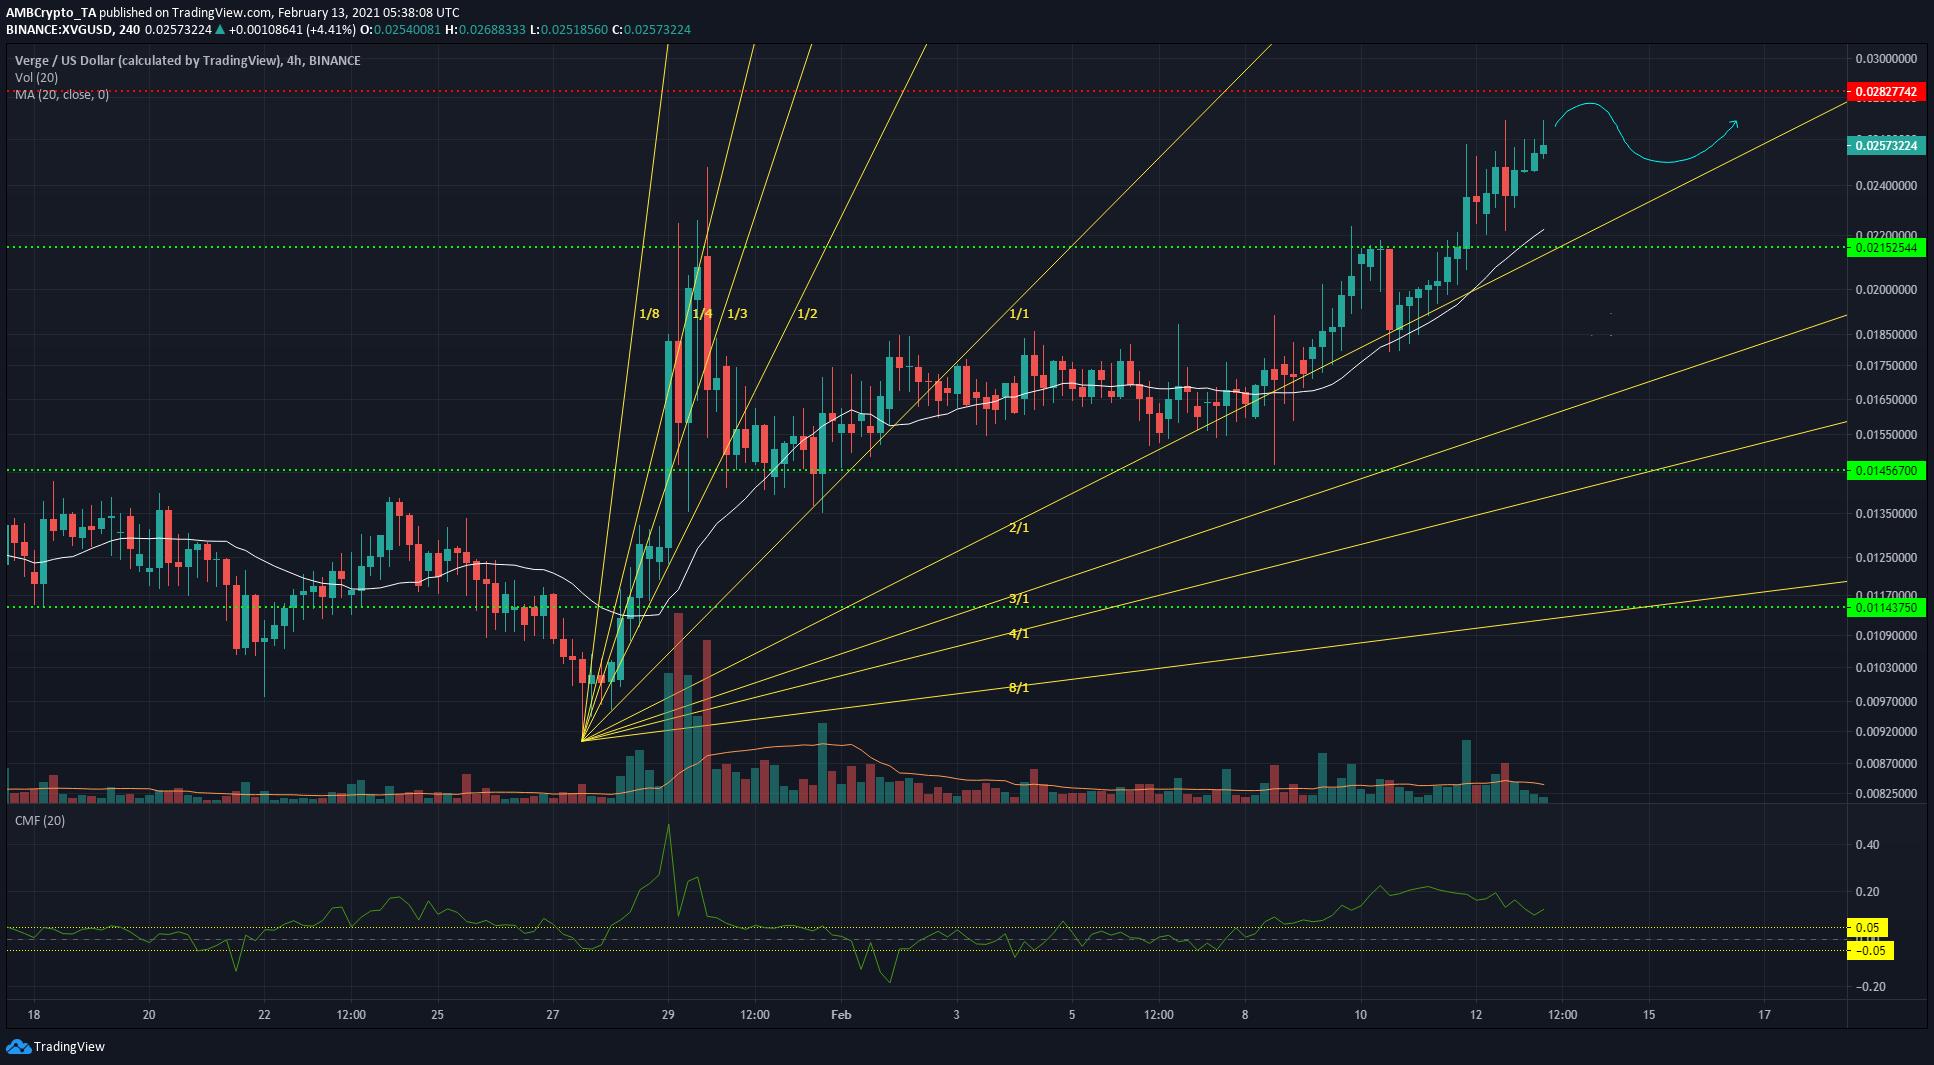 Bitcoin SV, NEM, Verge Price Analysis: 13 February